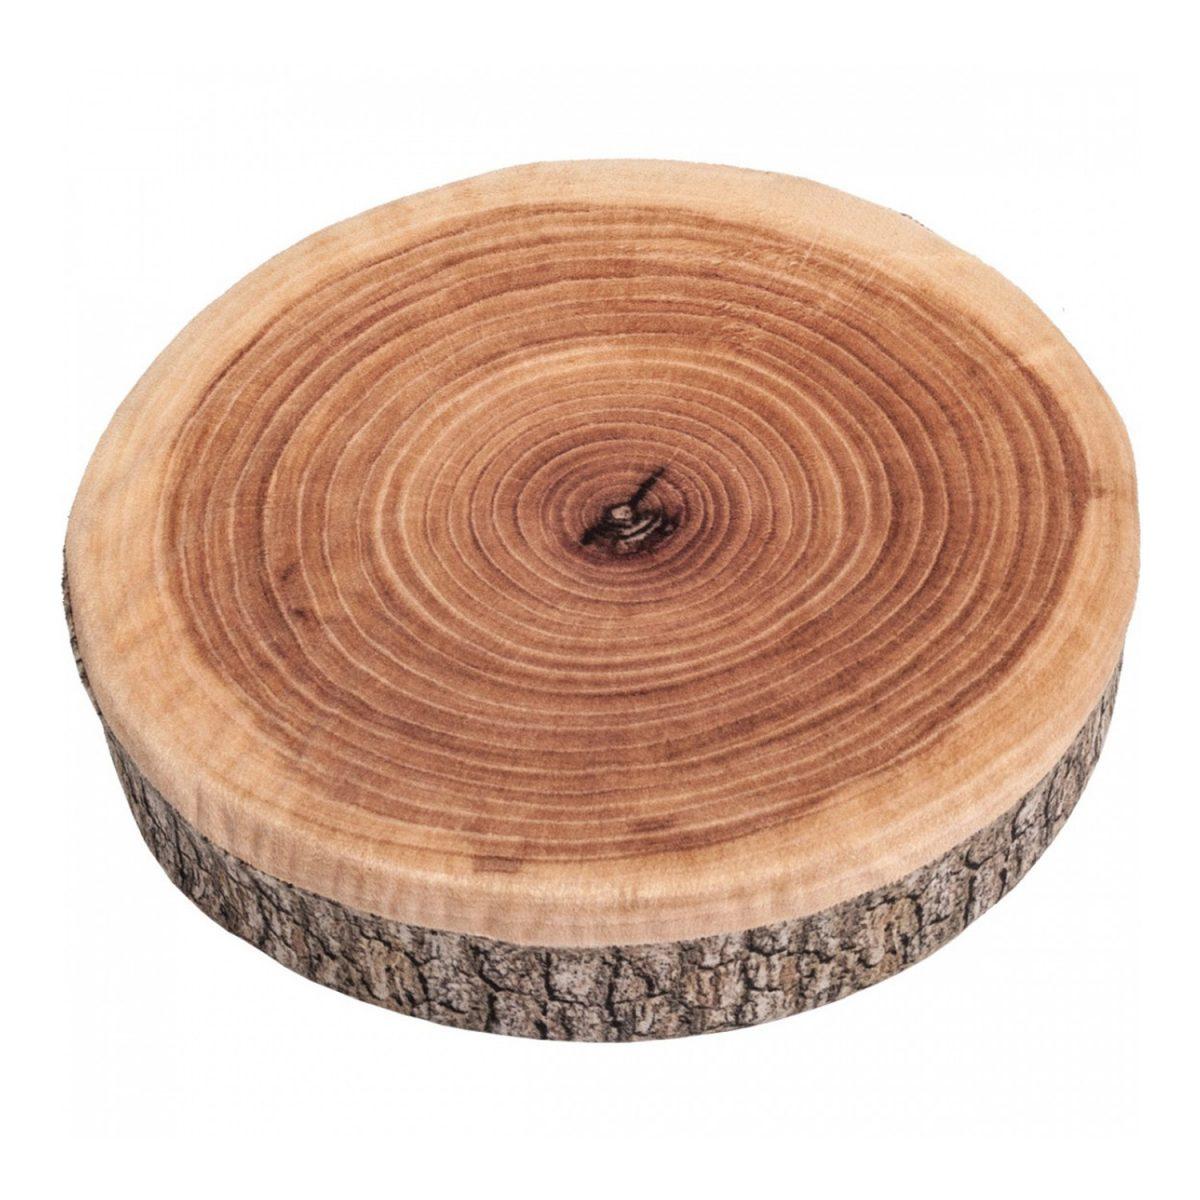 kuma wood chip pillow cushion studio